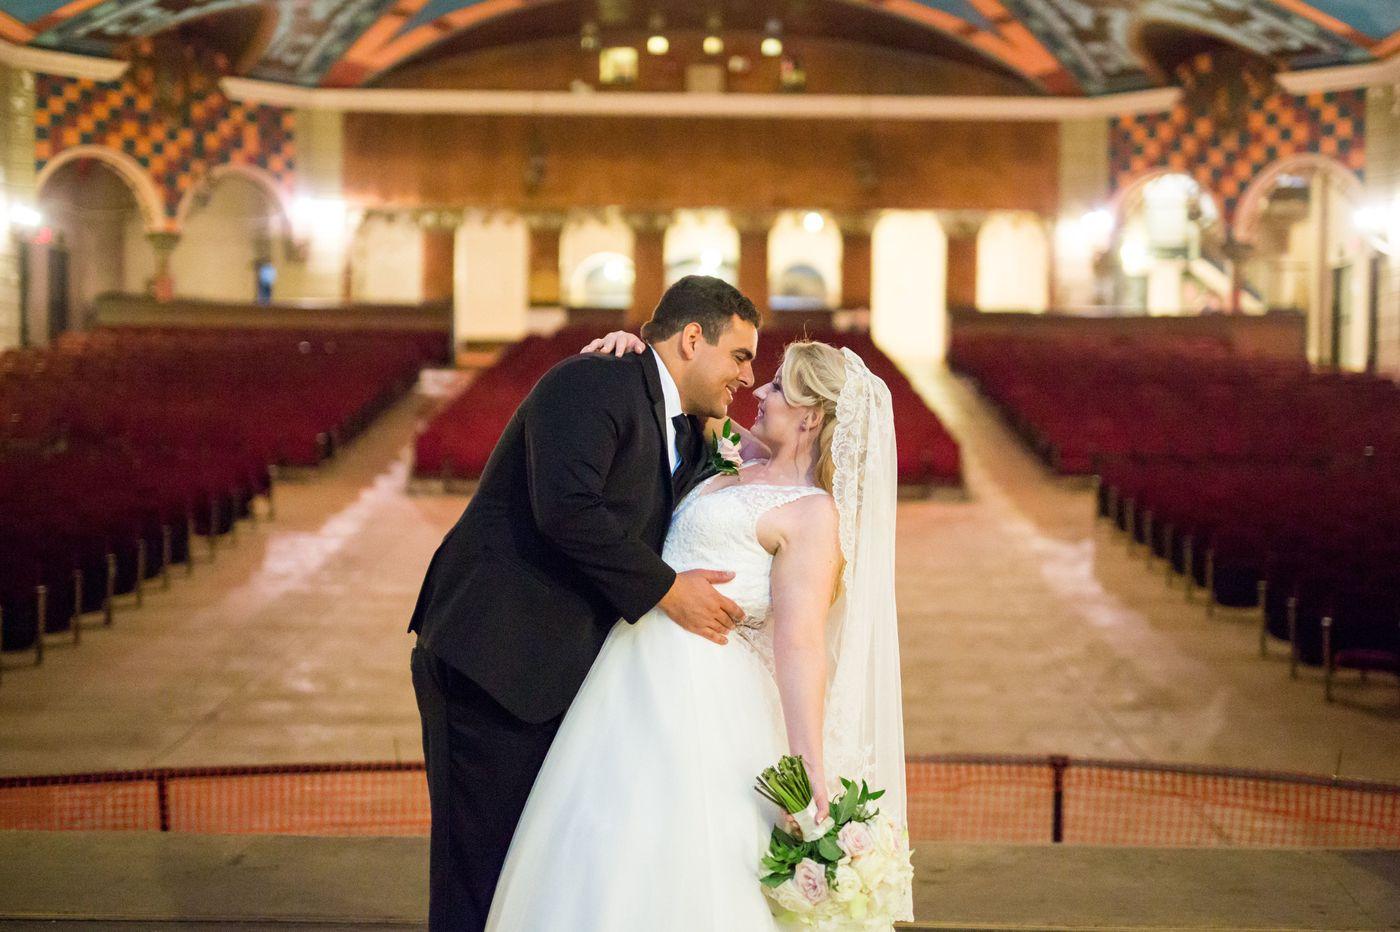 Philadelphia weddings: Victoria Doyle and Gabriel Morales